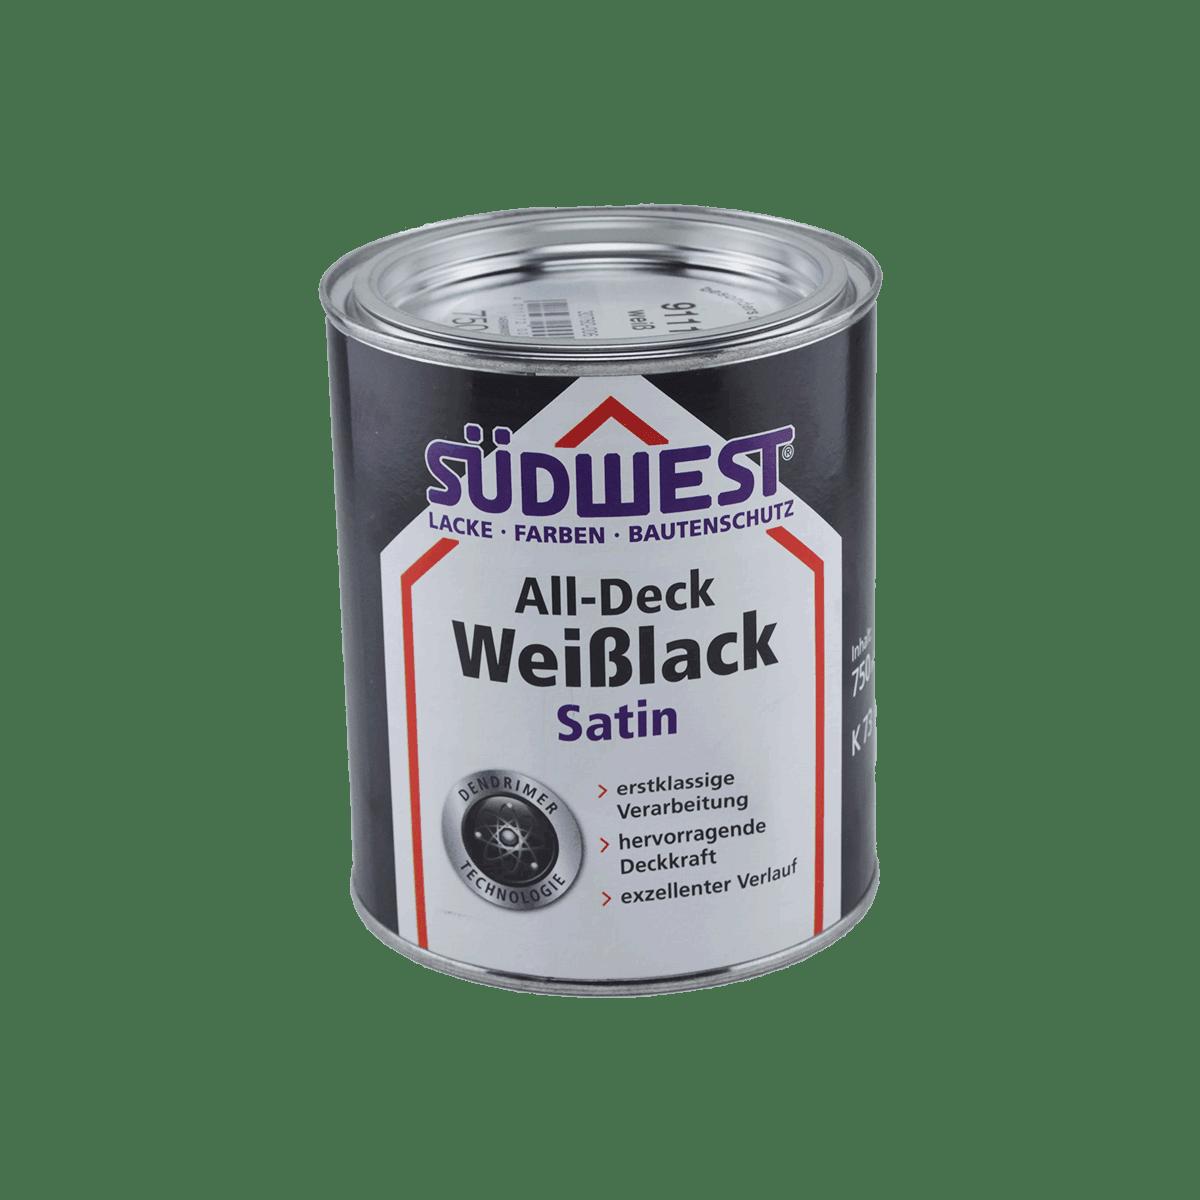 SÜDWEST All-Deck Weißlack Satin